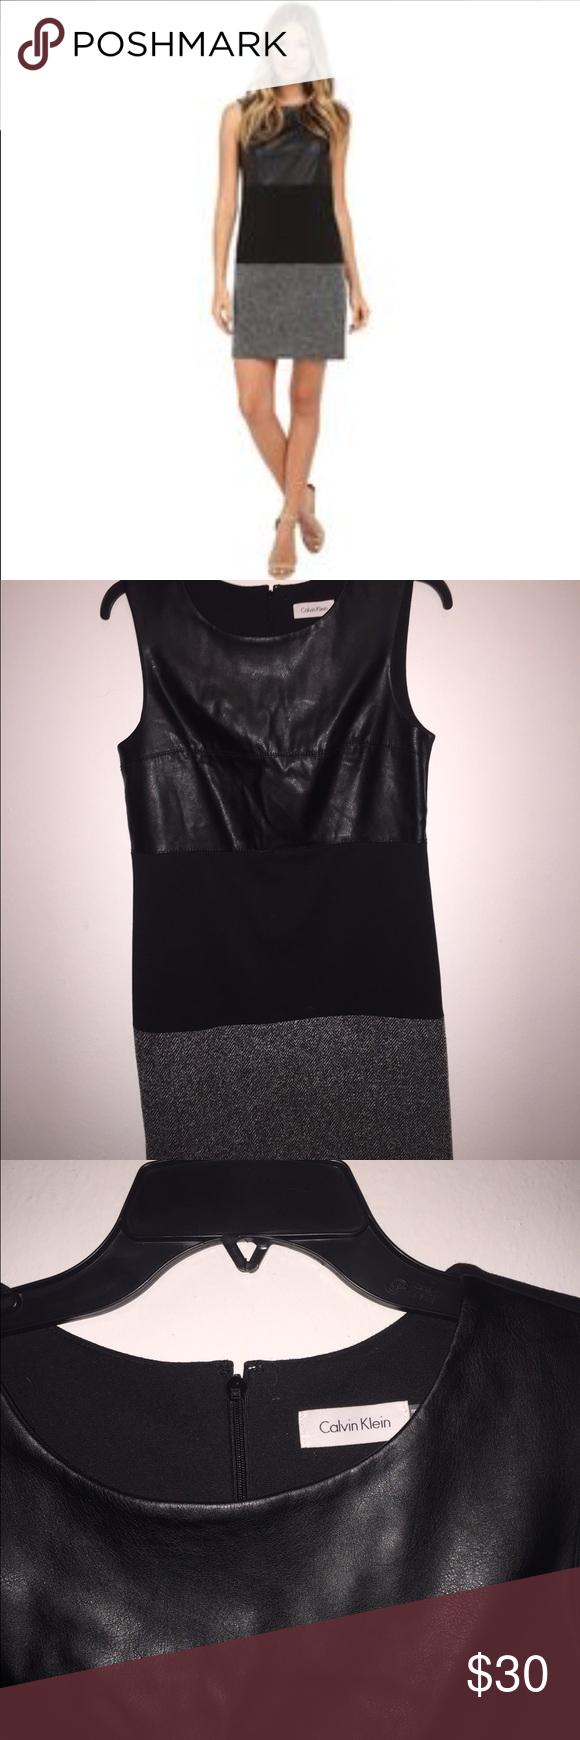 Calvin Klein sleeveless black tweed dress Calvin Klein sleeveless black tweed dress Calvin Klein Dresses